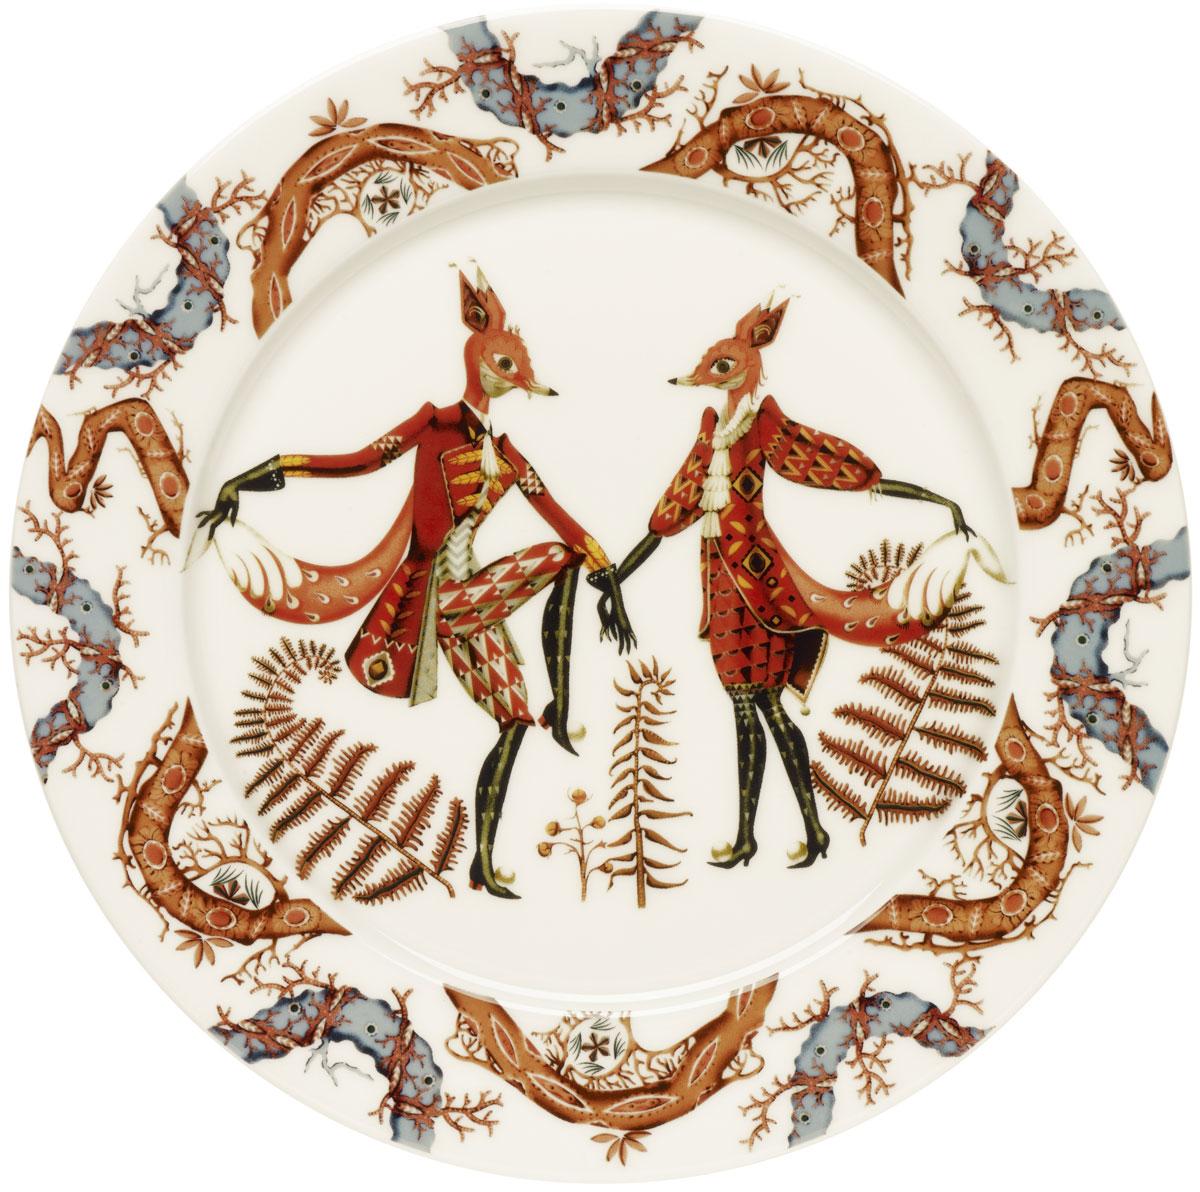 Тарелка Iittala Tanssi, диаметр 27 см1015528